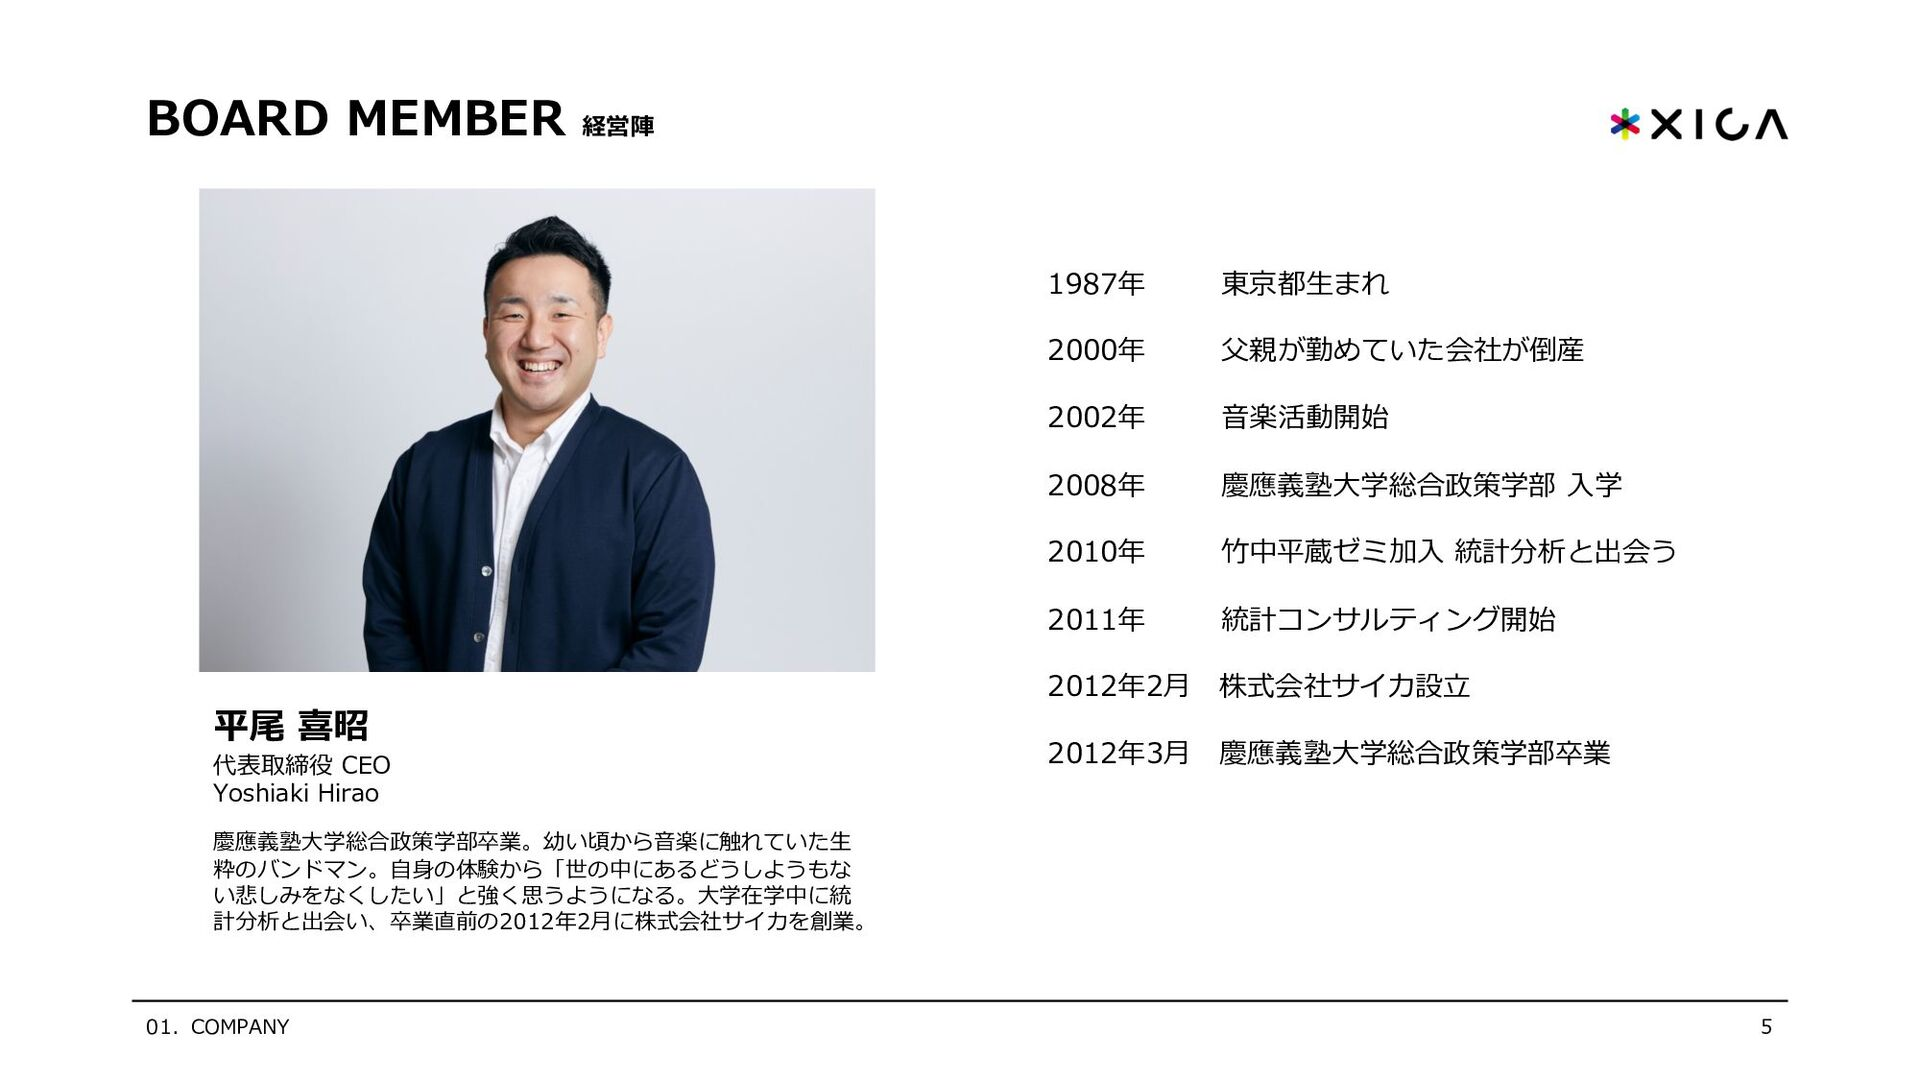 BOARD MEMBER 経営陣 平尾 喜昭 代表取締役 CEO Yoshiaki Hirao...